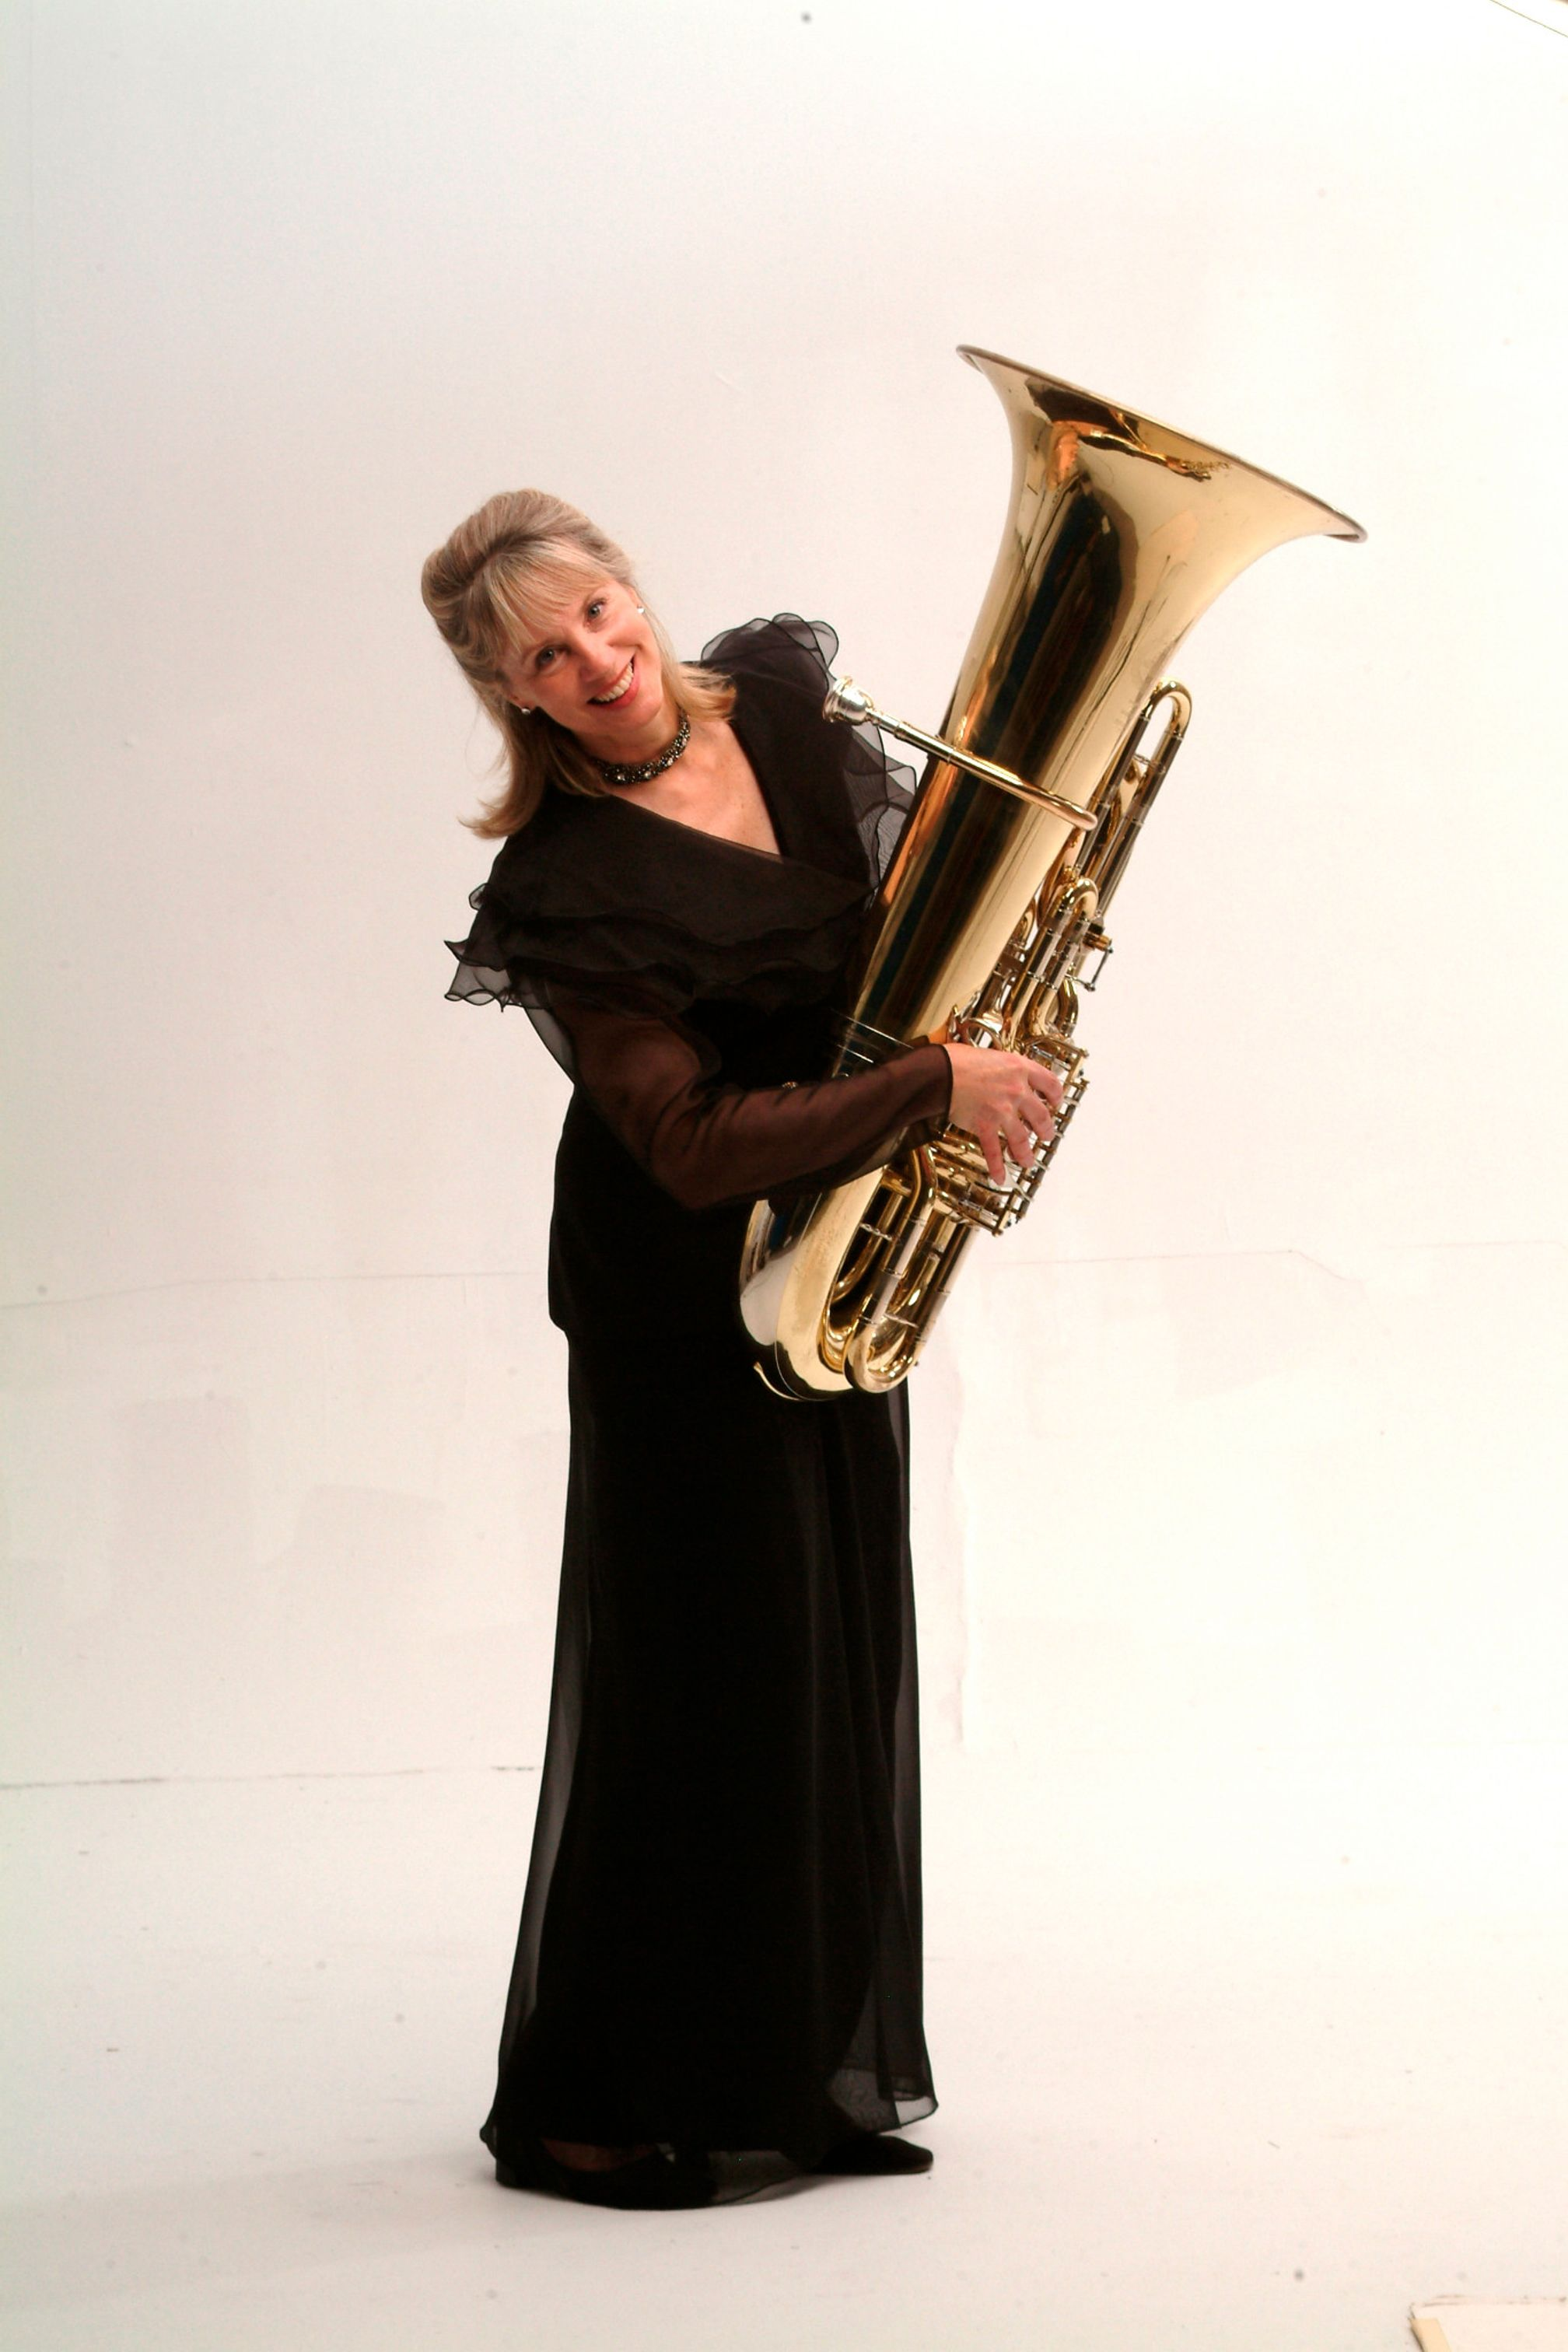 Kathleen Brantigan holding a tuba